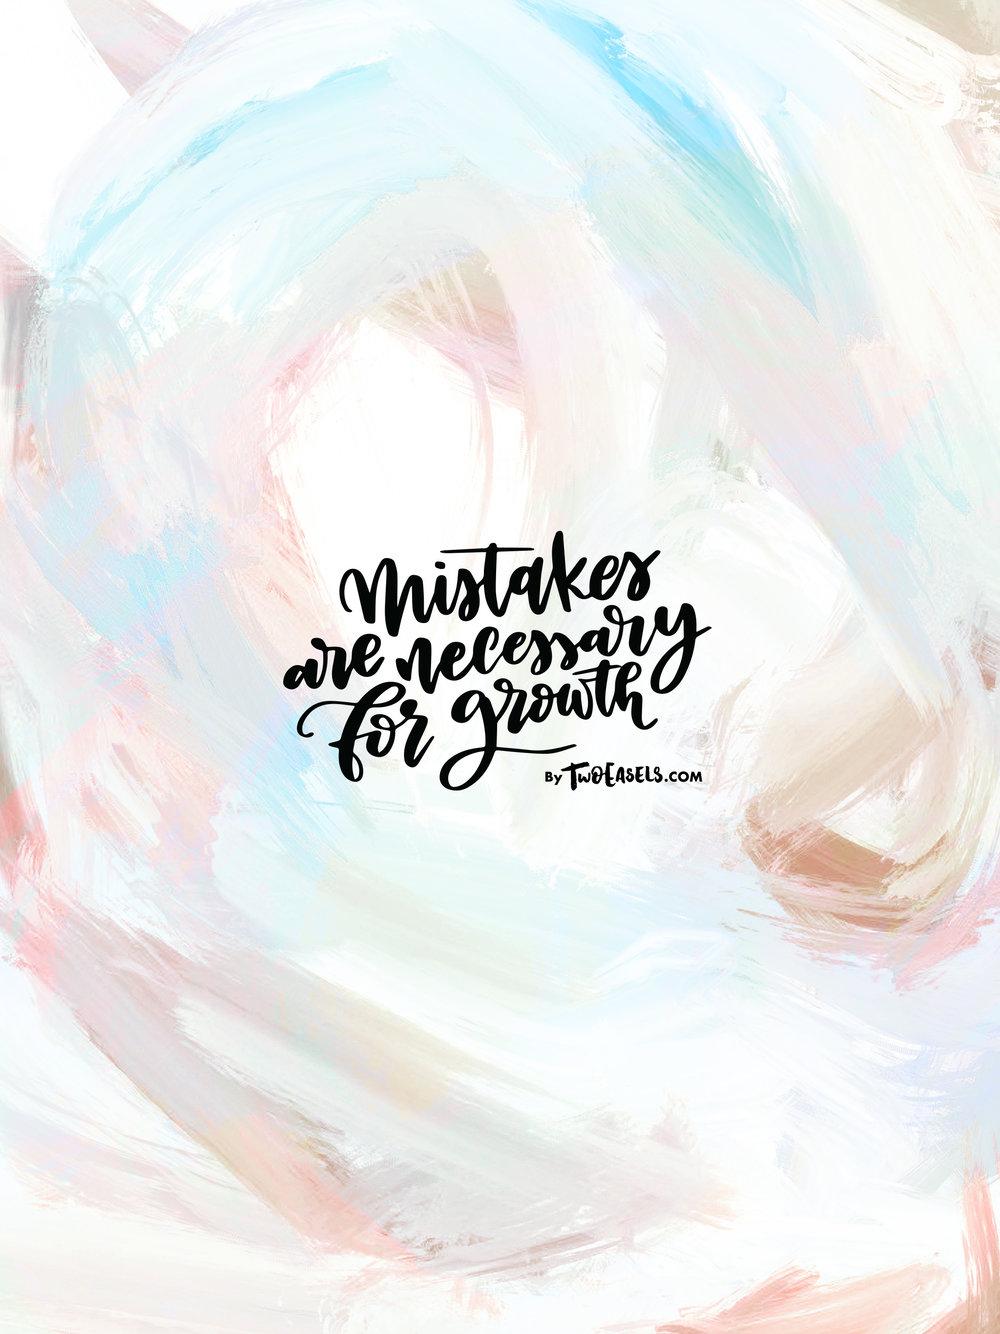 Mistakes-iPad-October-TwoEasels.jpg October free wallpaper